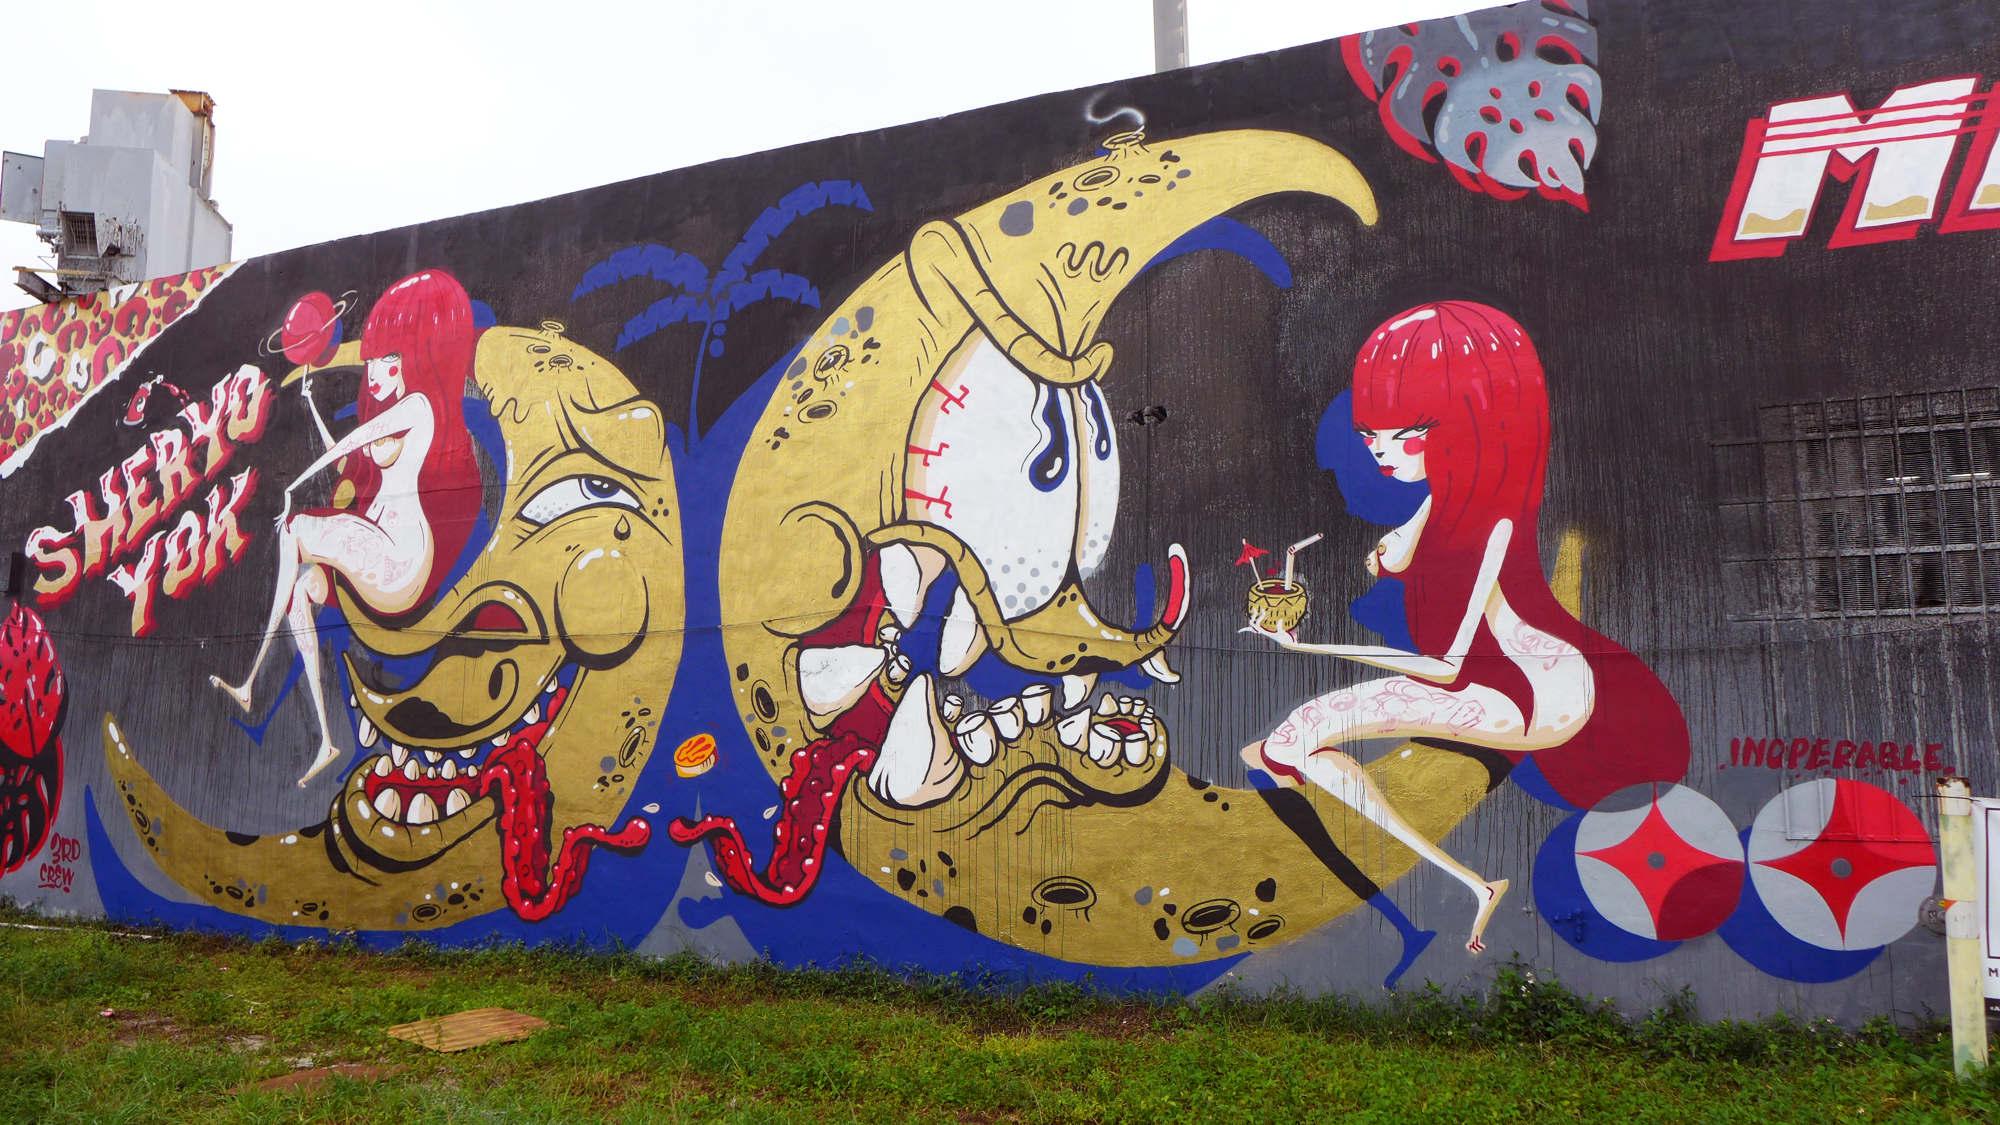 yok-sheryo-graffiti-cartoon-skateboard-15